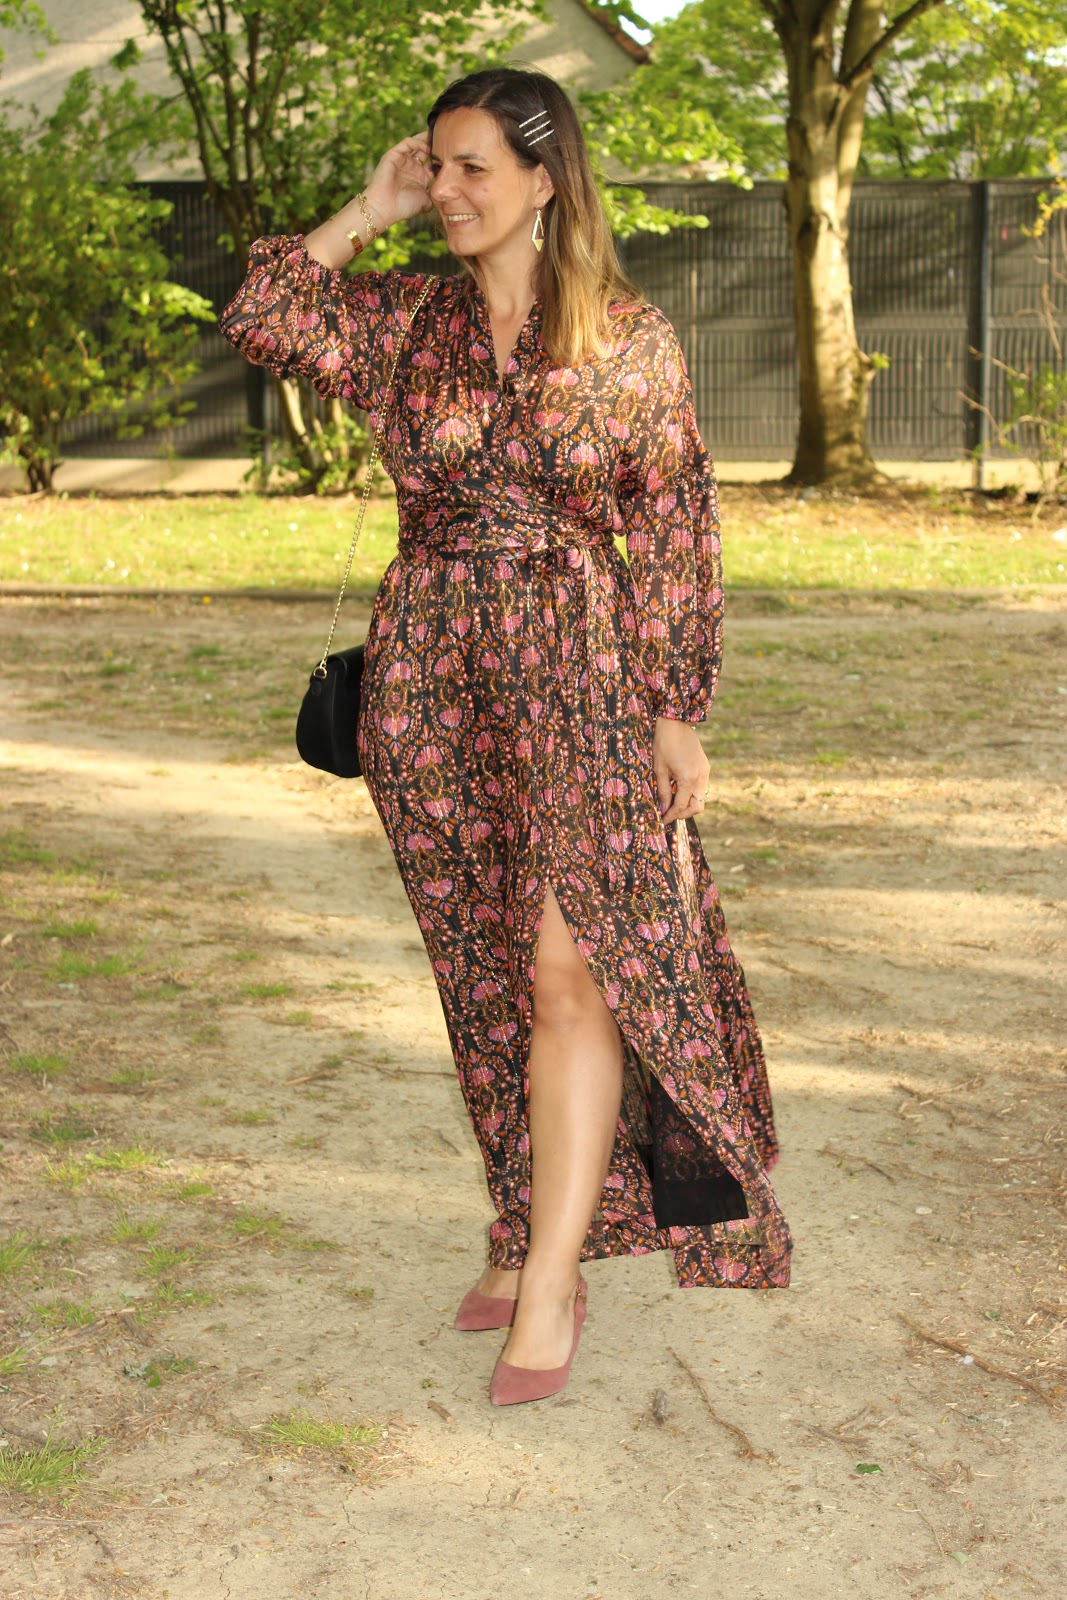 robe zara, escarpins rose minelli, les petites bulles de ma vie